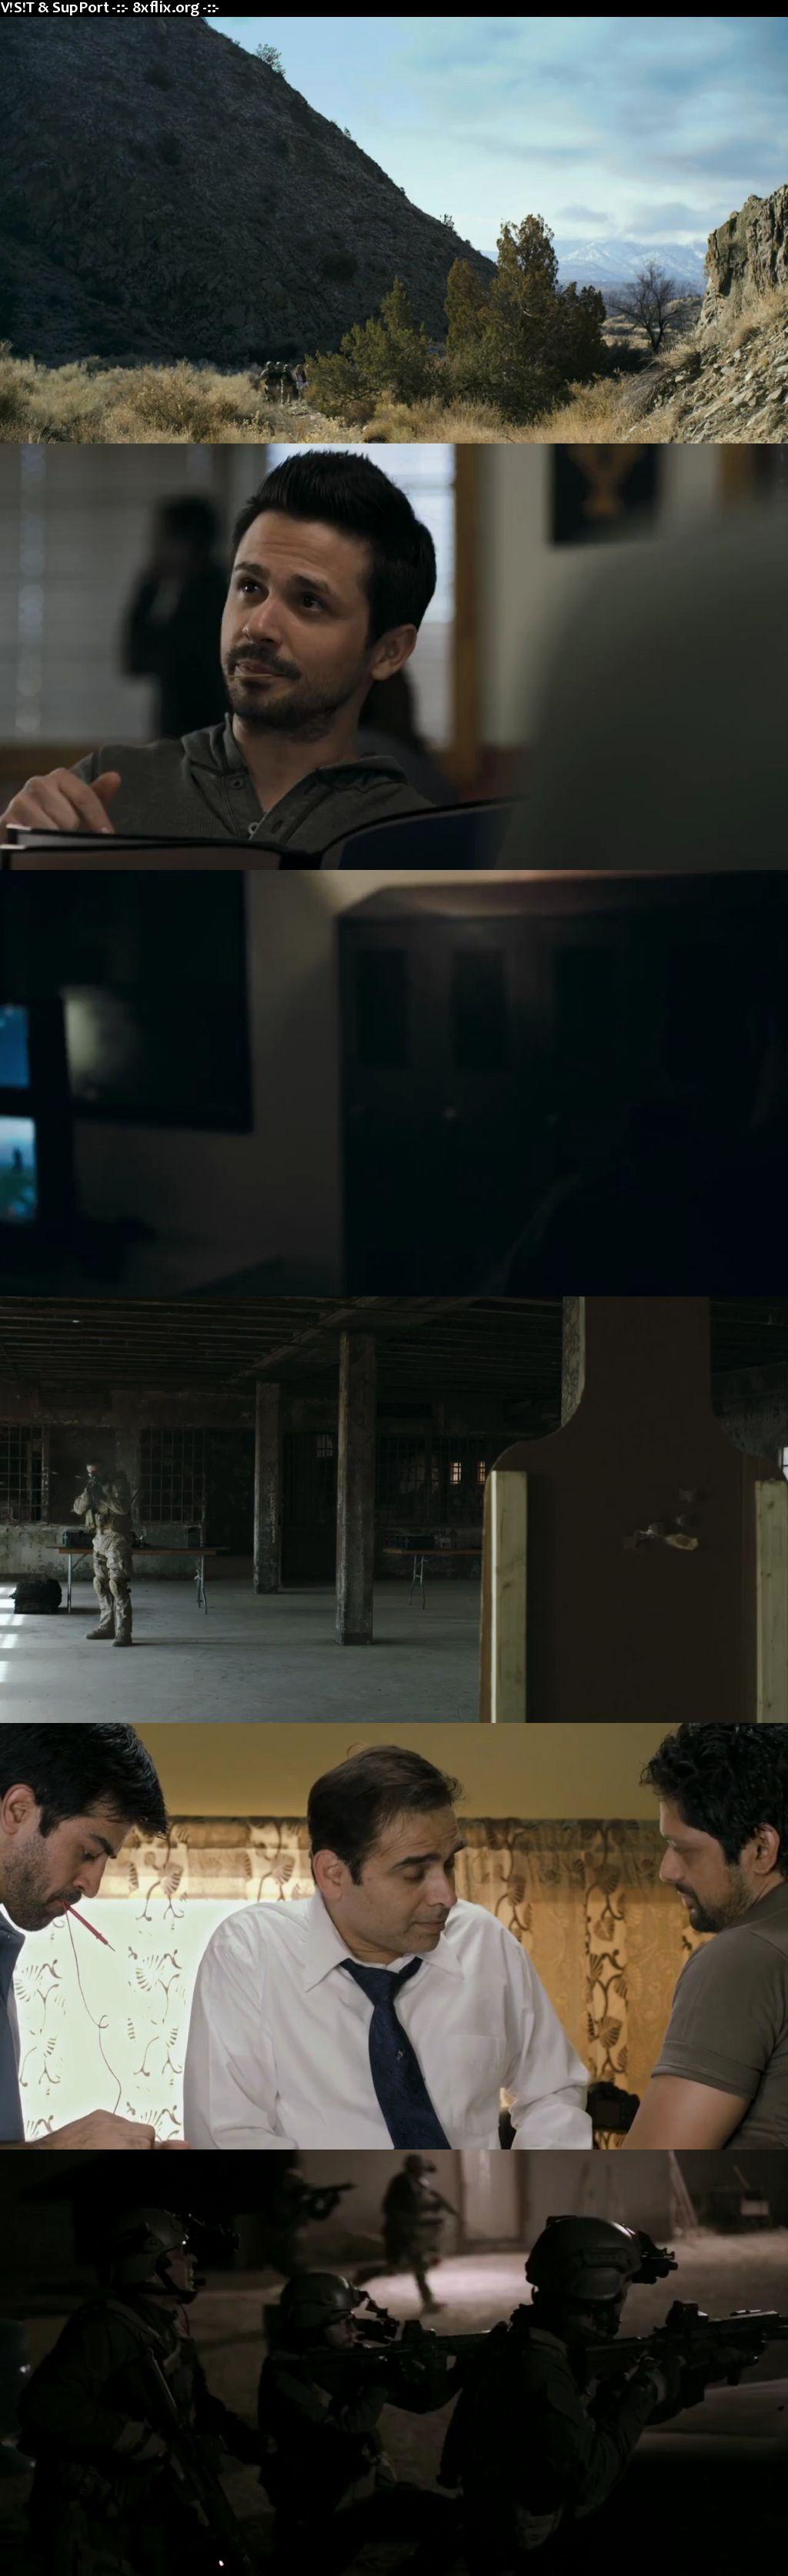 Seal Team Six The Raid On Osama Bin Laden 2012 Hindi English Dual Audio 720p 480p BluRay